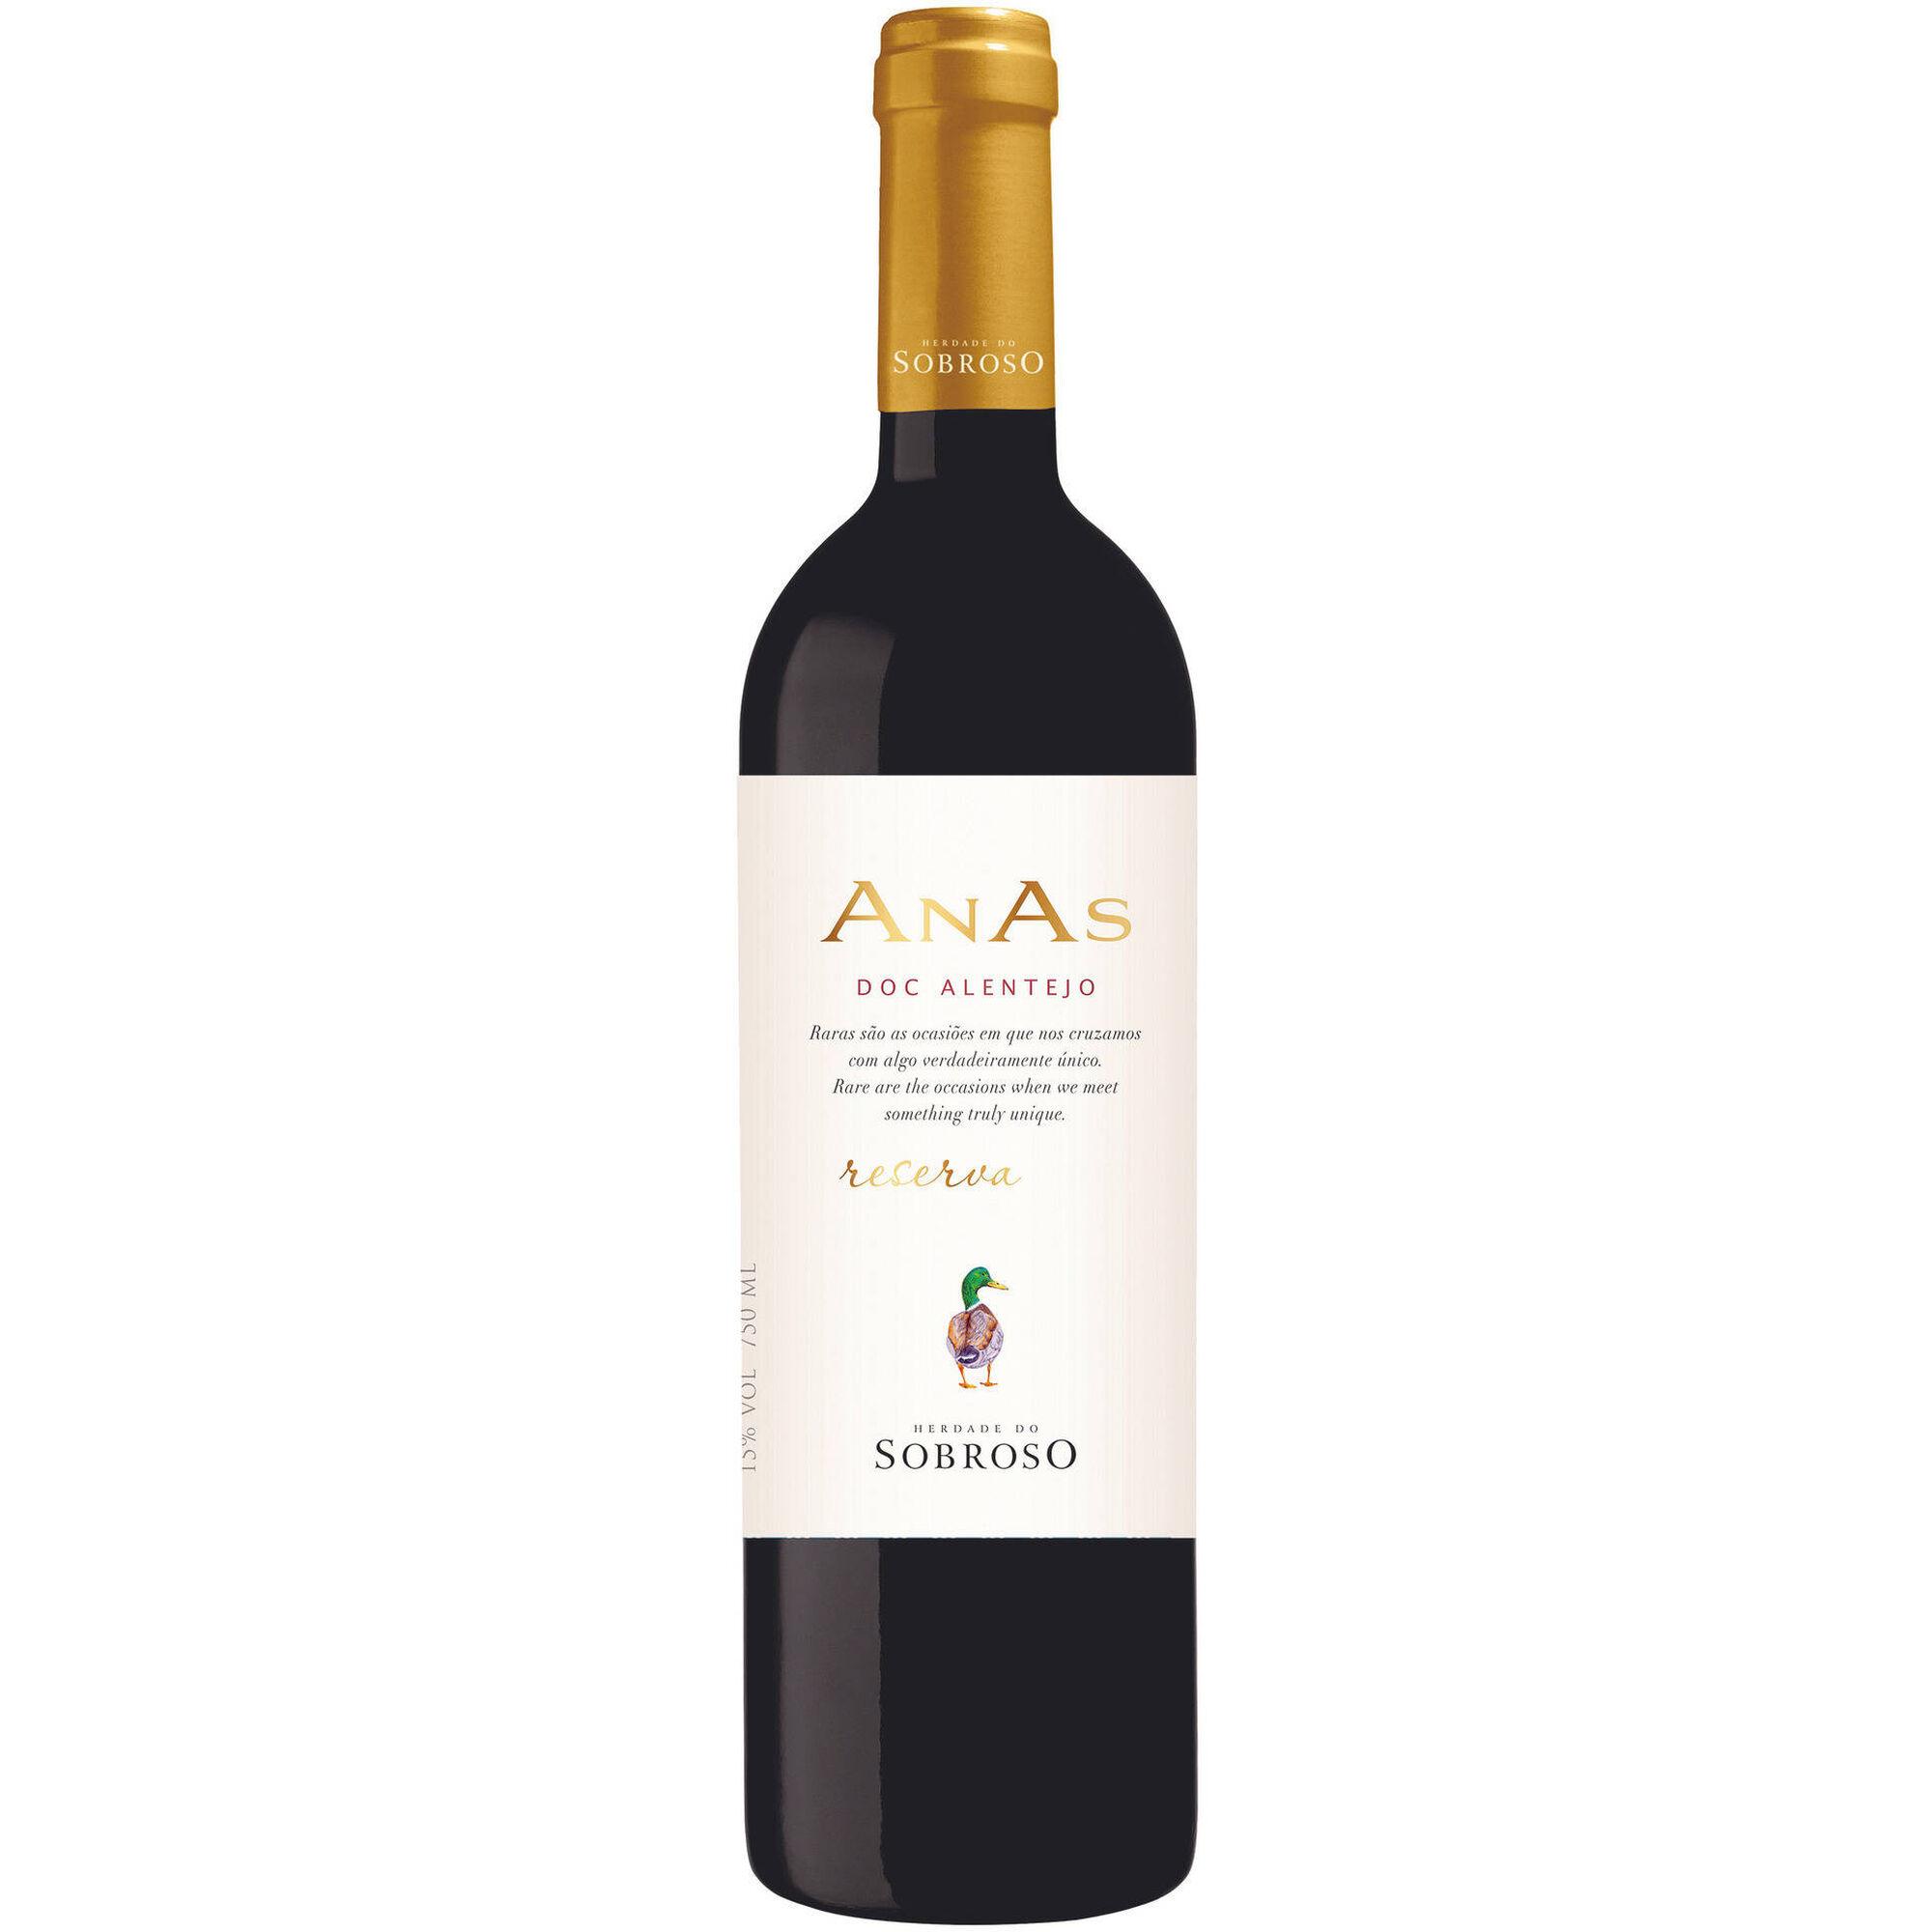 Anas Sobroso Reserva DOC Alentejo Vinho Tinto